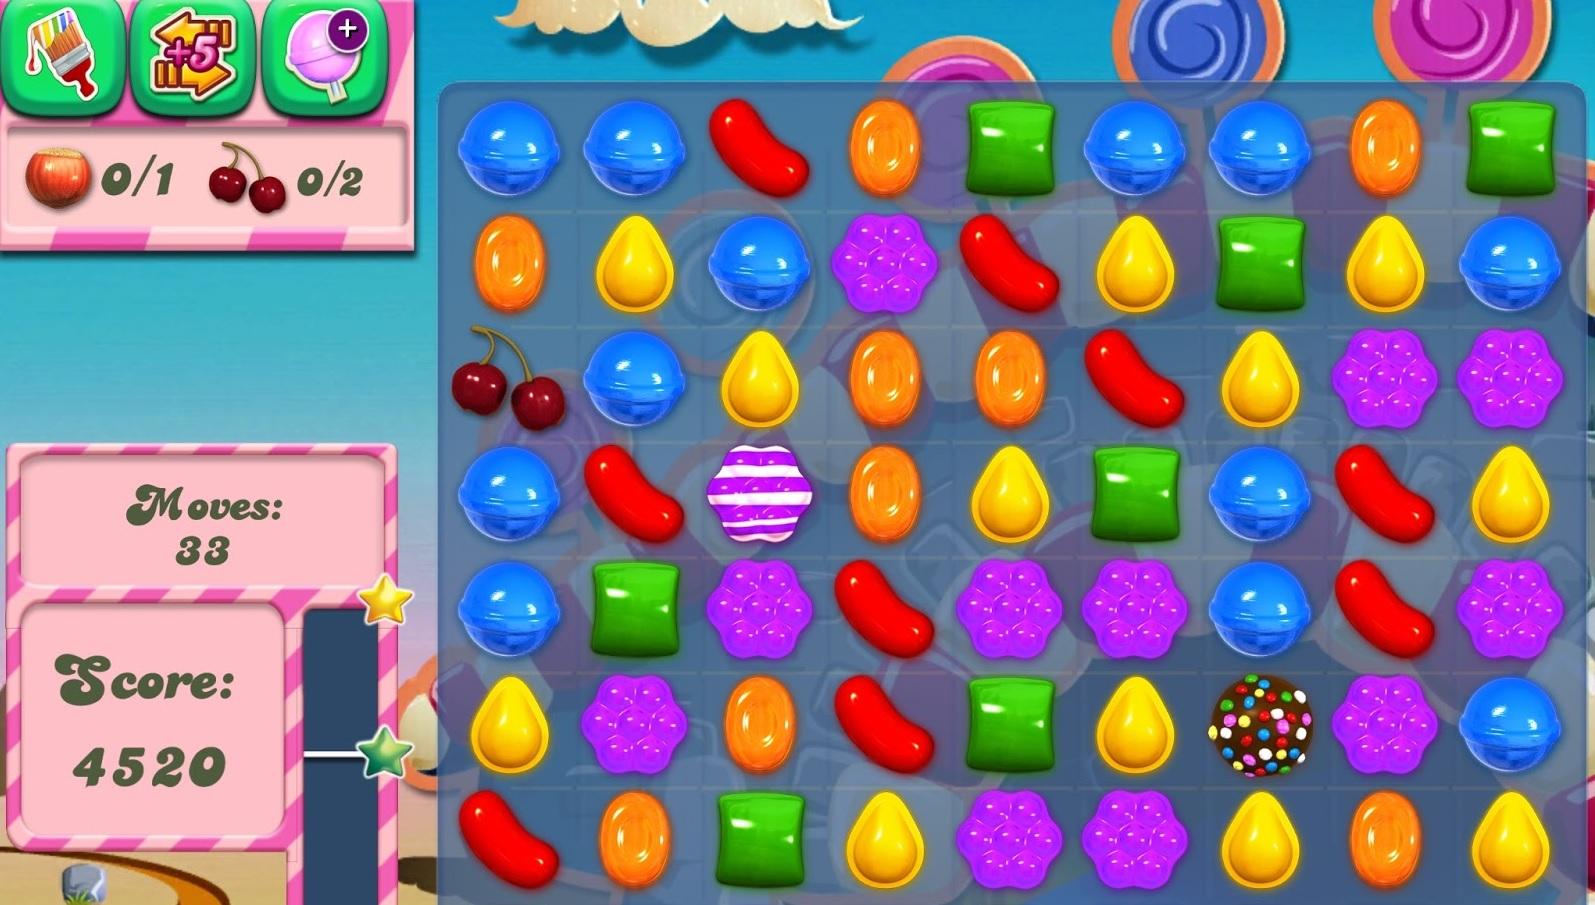 Activision Blizzard Candy Crush Saga